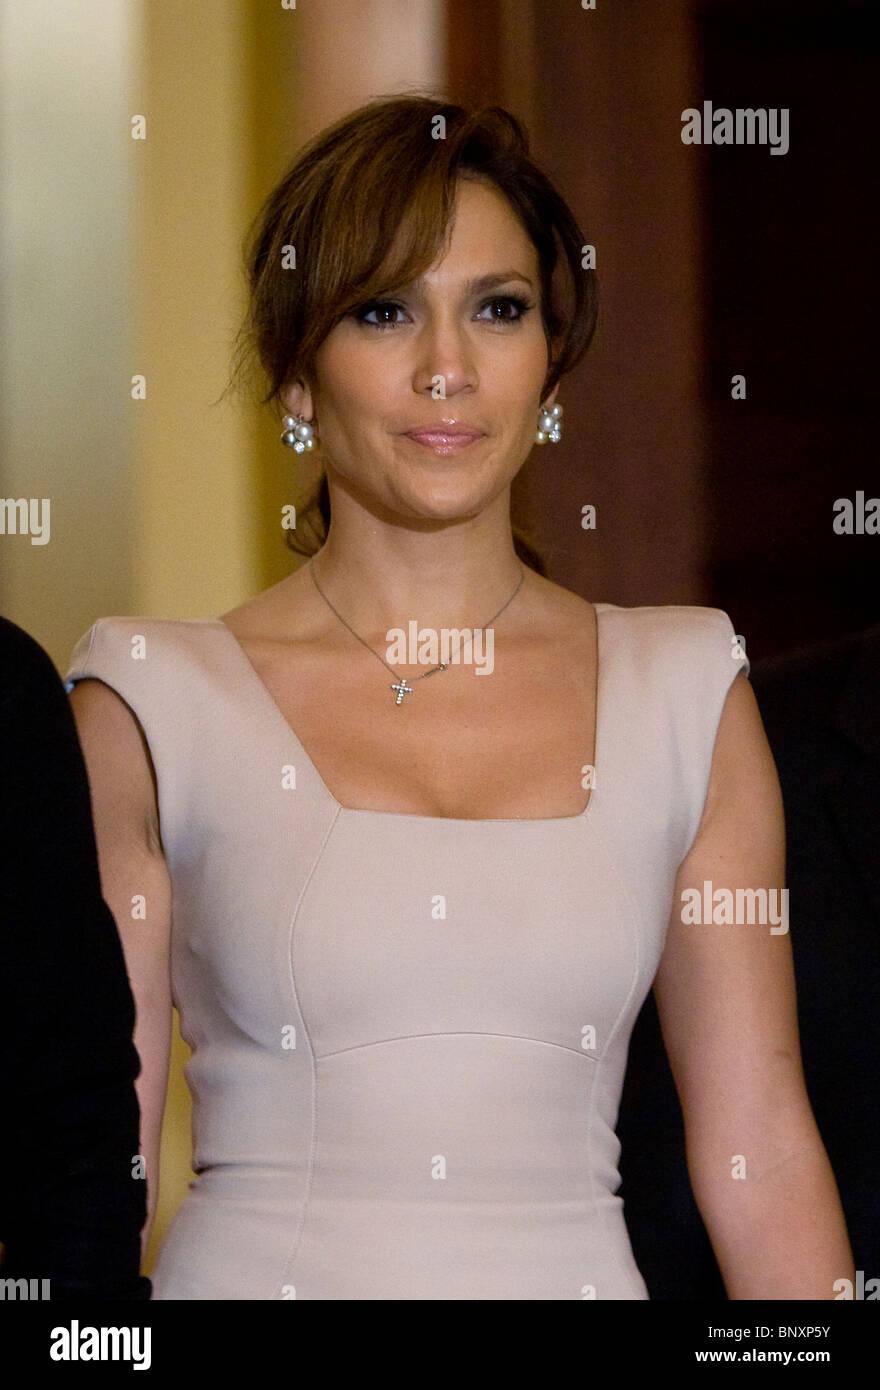 Schauspielerin Jennifer Lopez. Stockbild